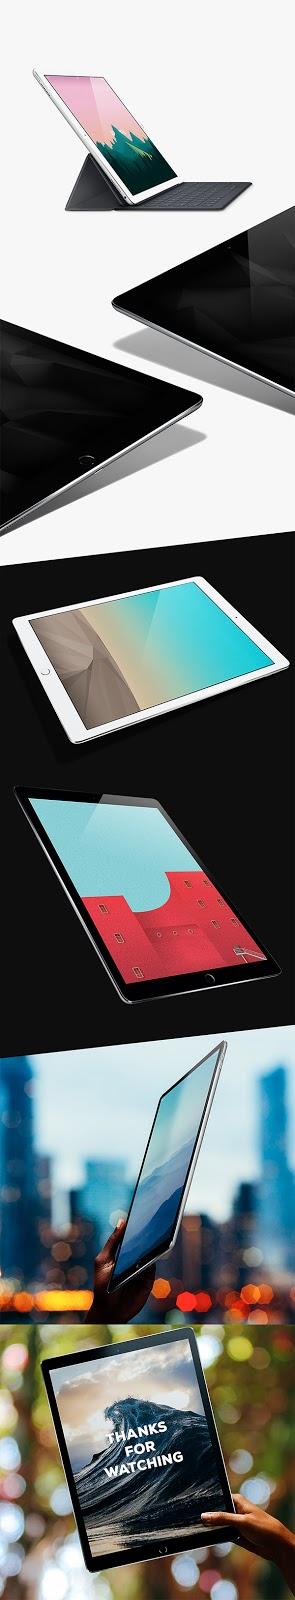 Smartphone & Tablet Mockup PSD Terbaru Gratis - iPad Pro Mockups